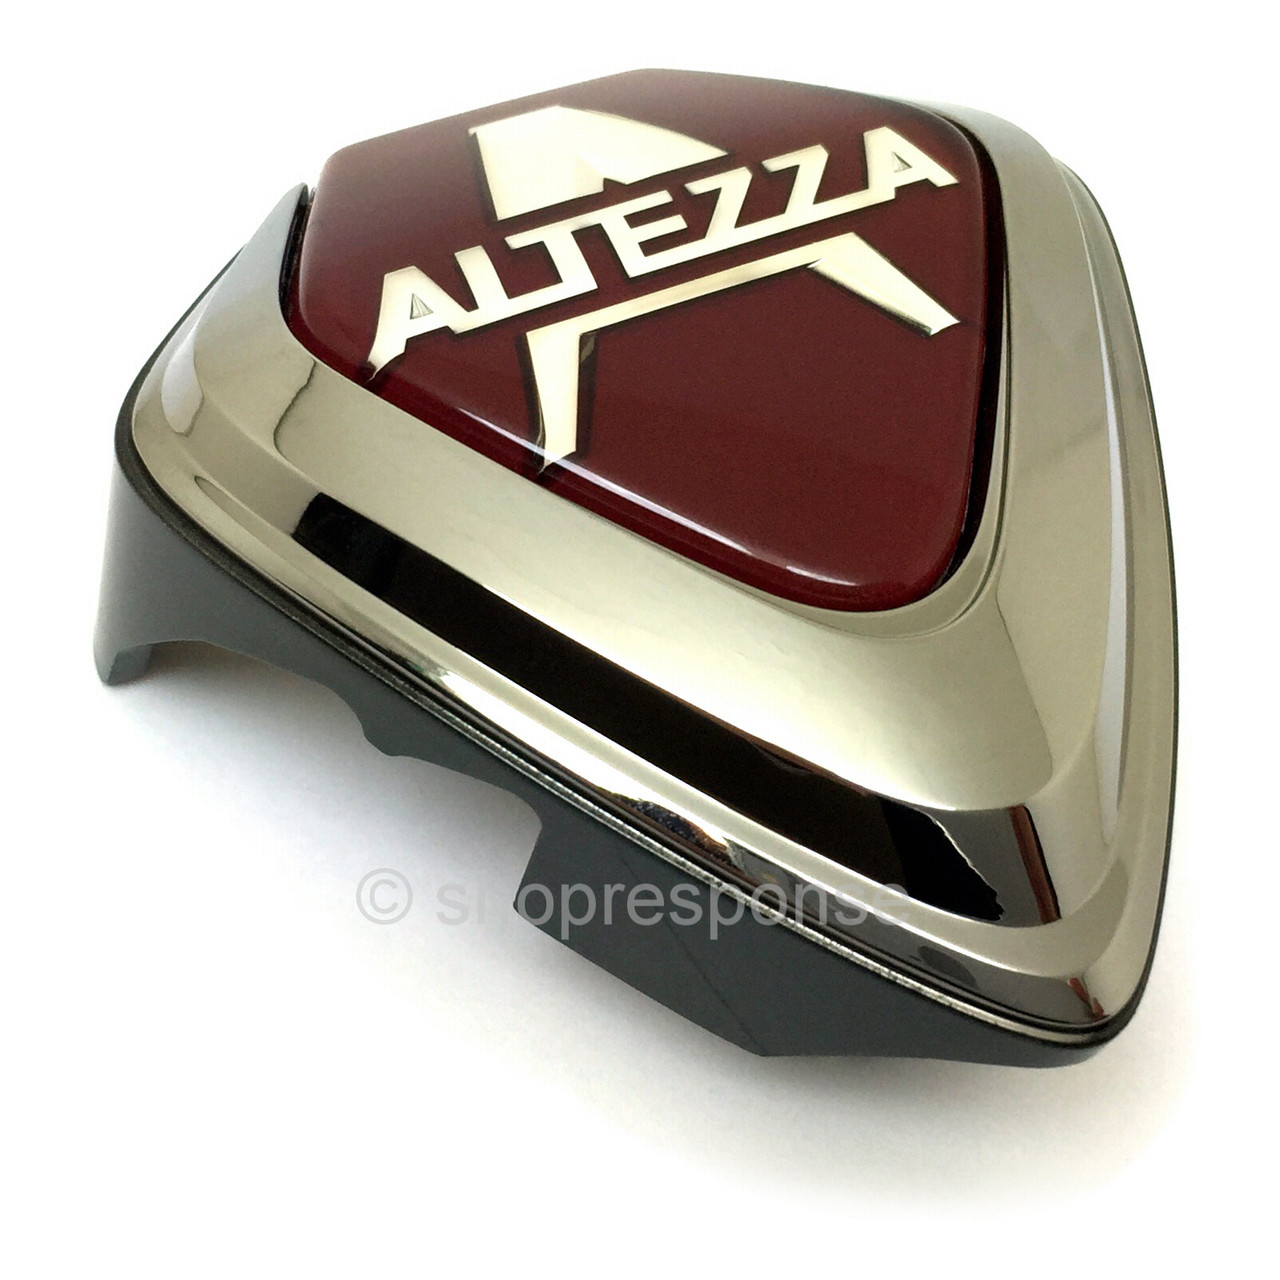 Altezza Grill With Lexus Emblem Grill Altezza Emblem